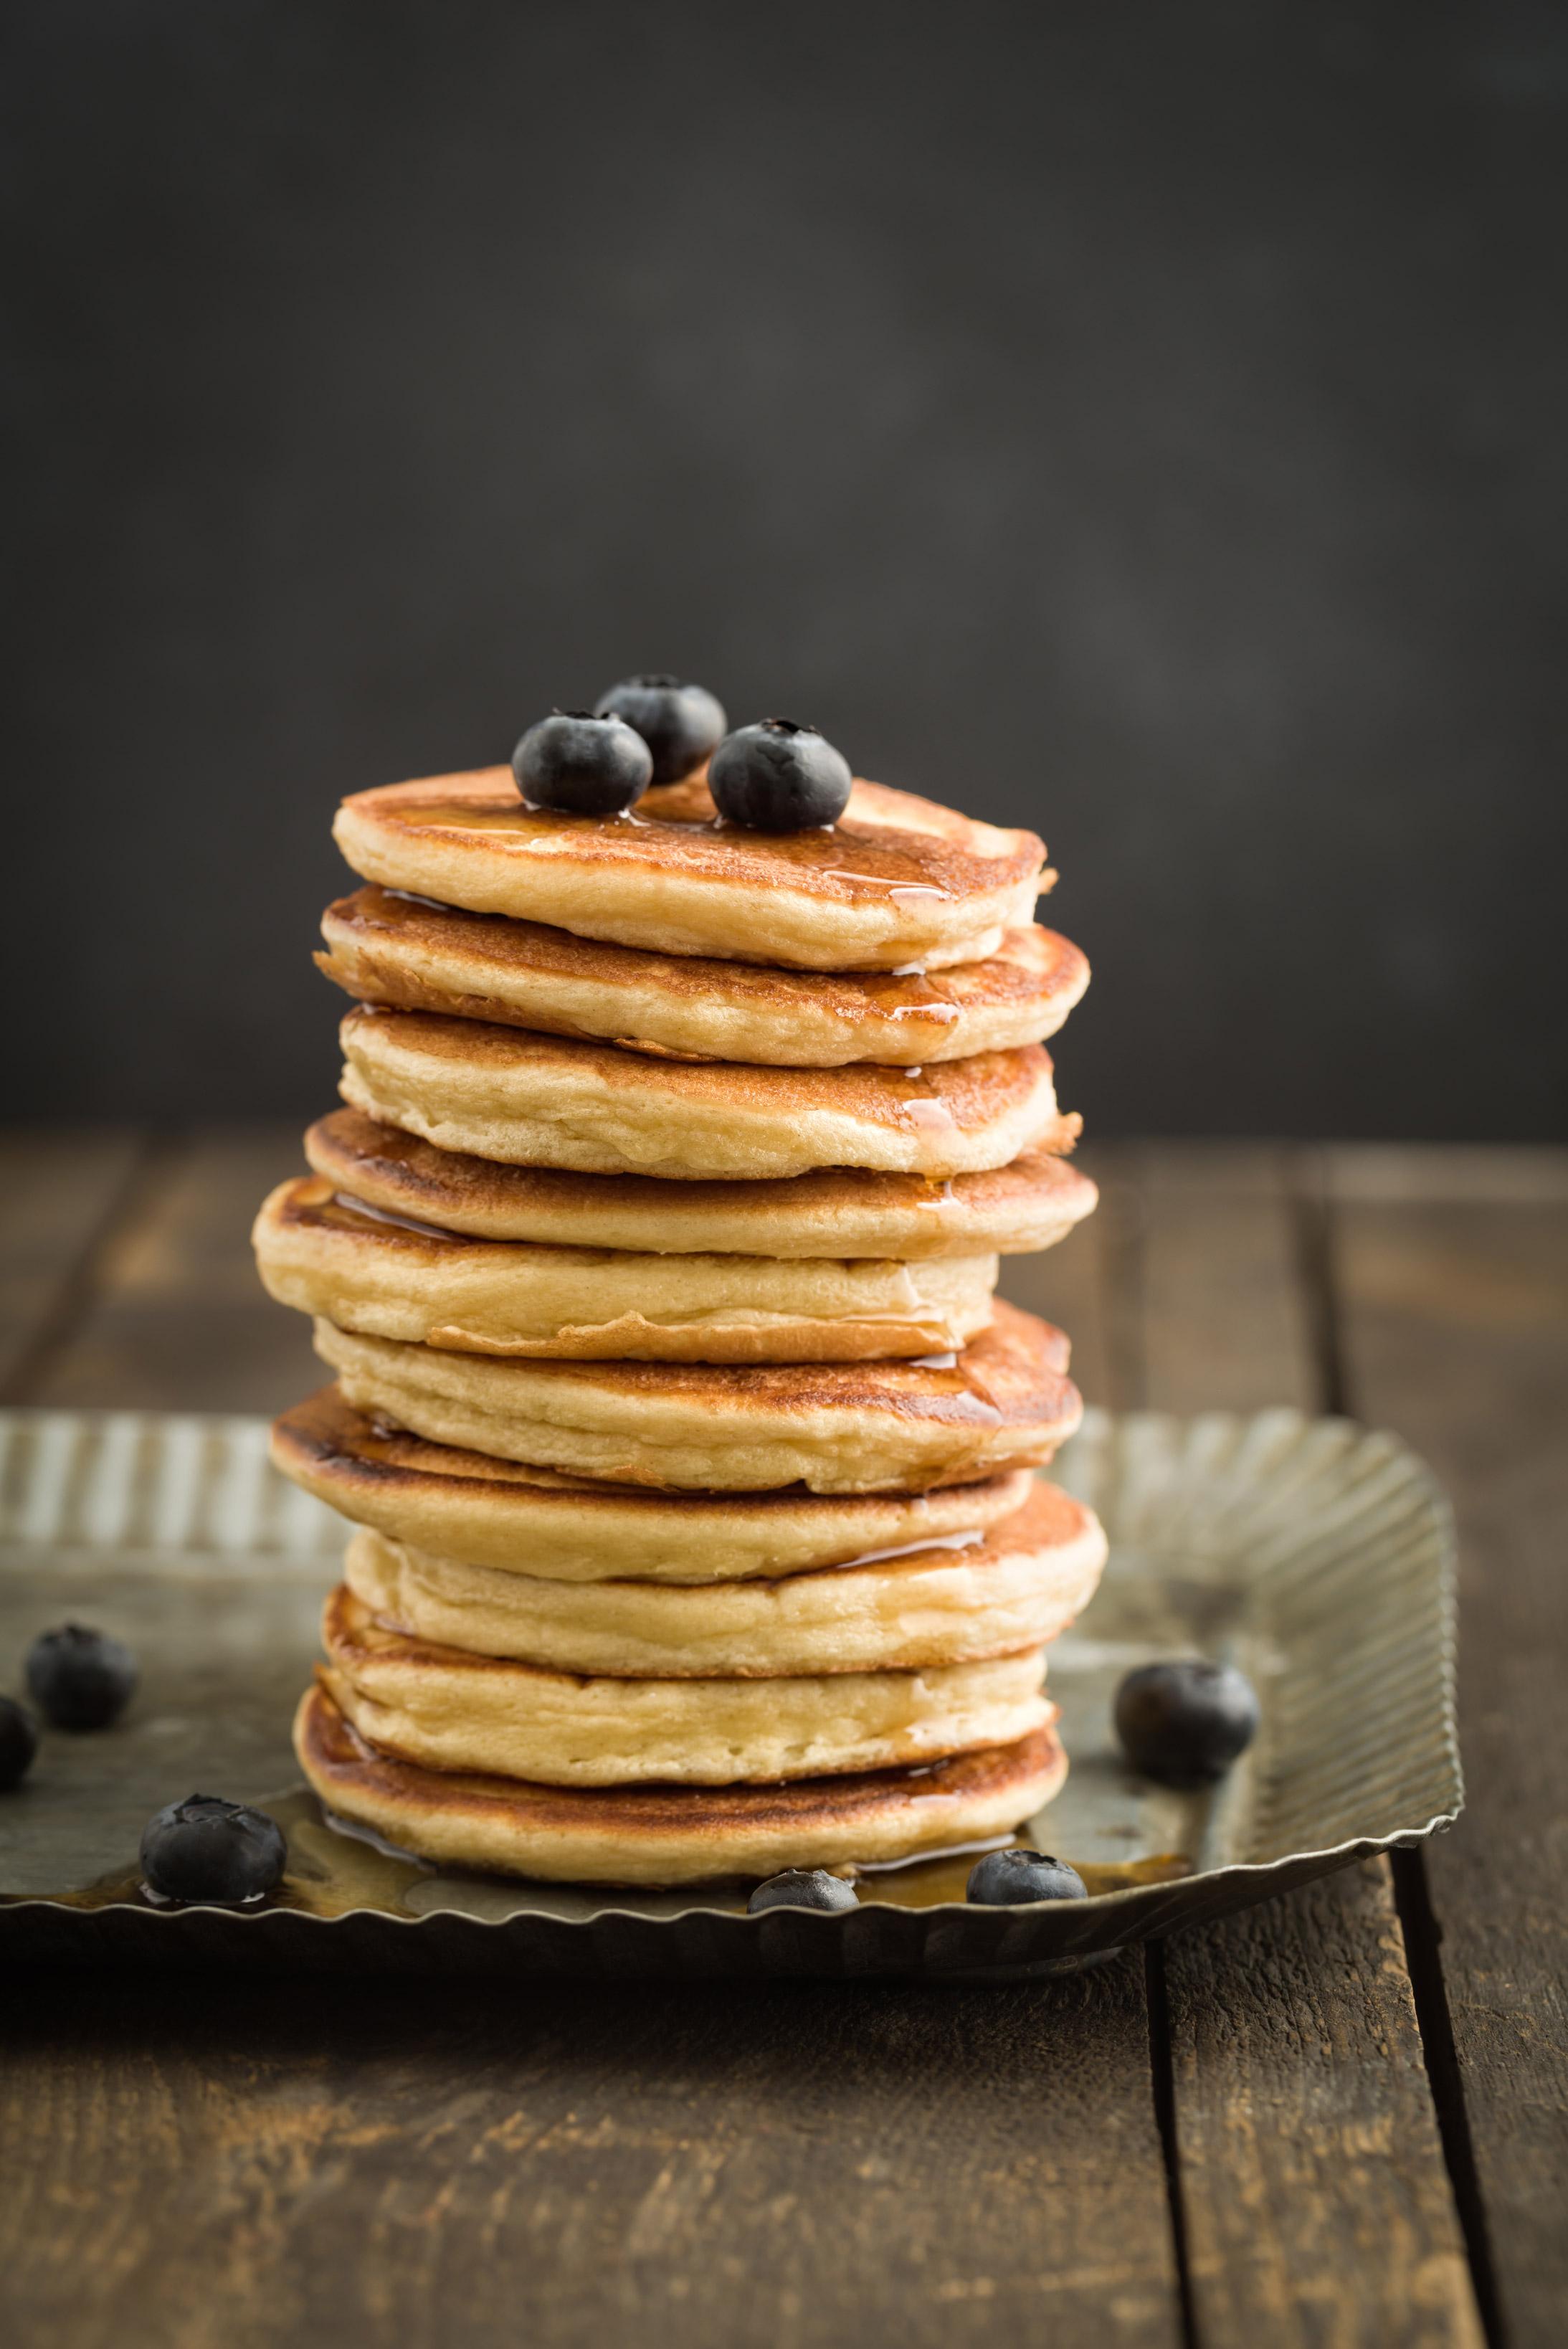 American pancakes - foodphotolove.de